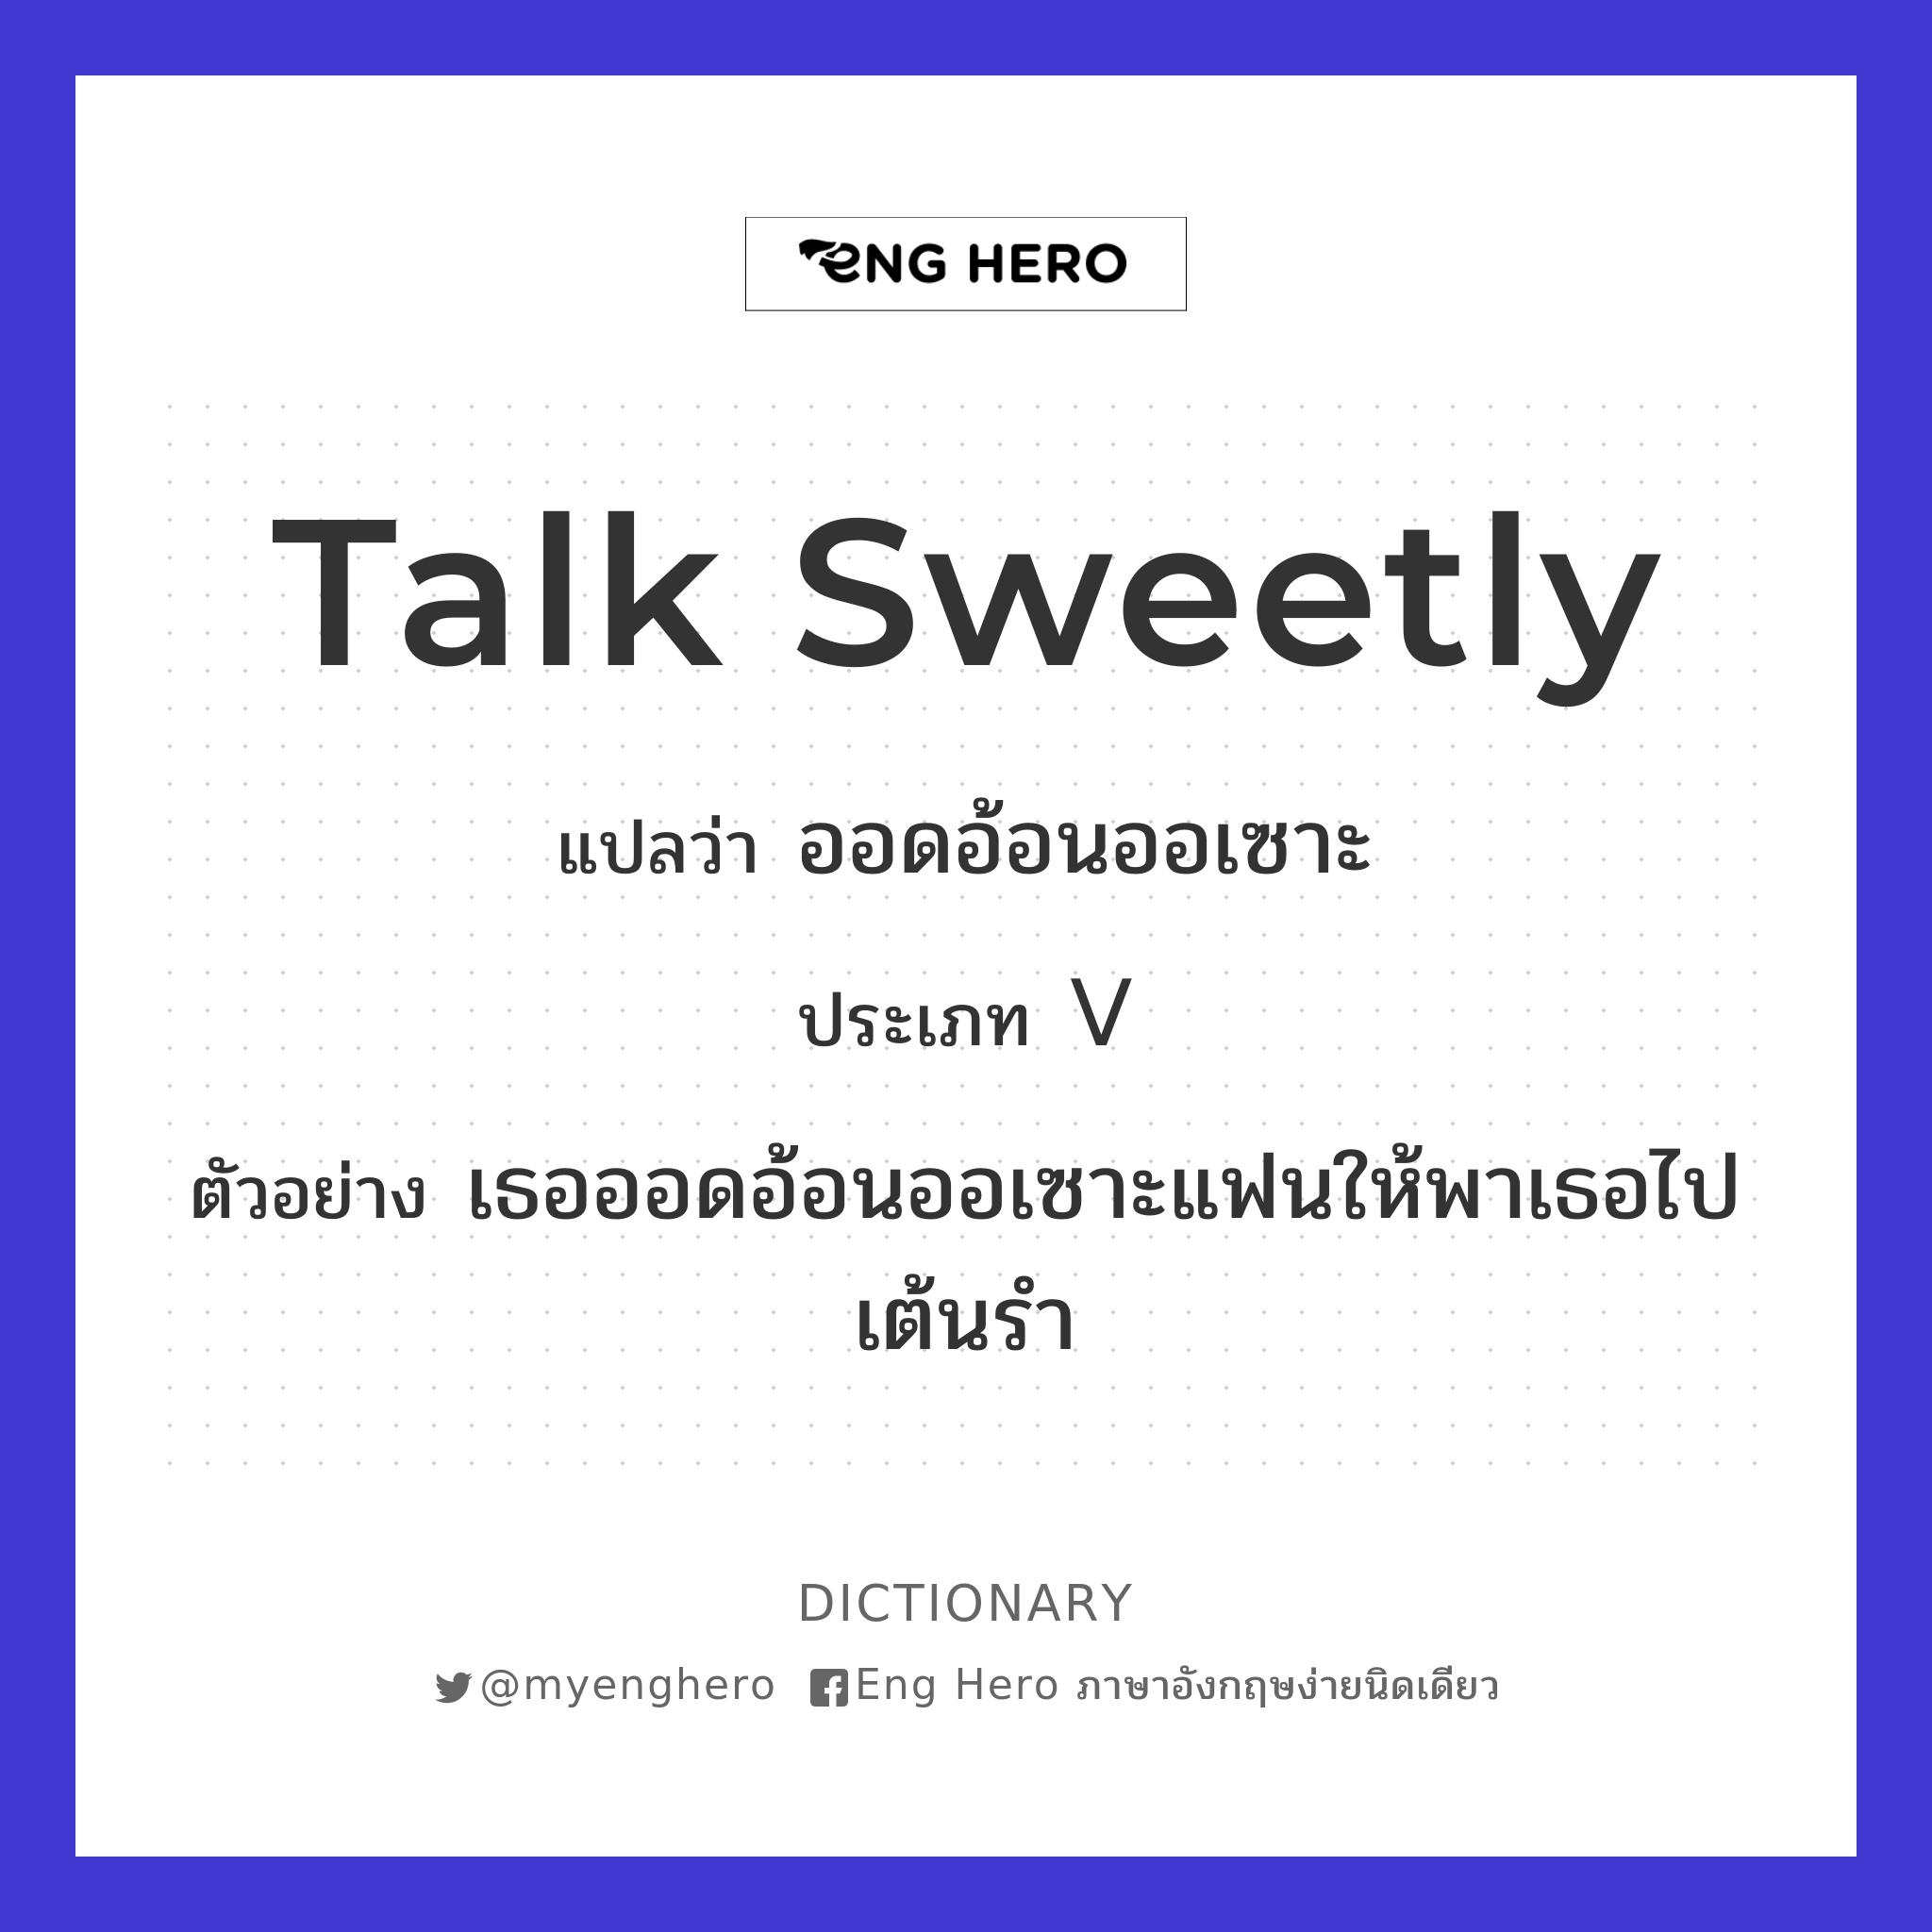 (talk) sweetly